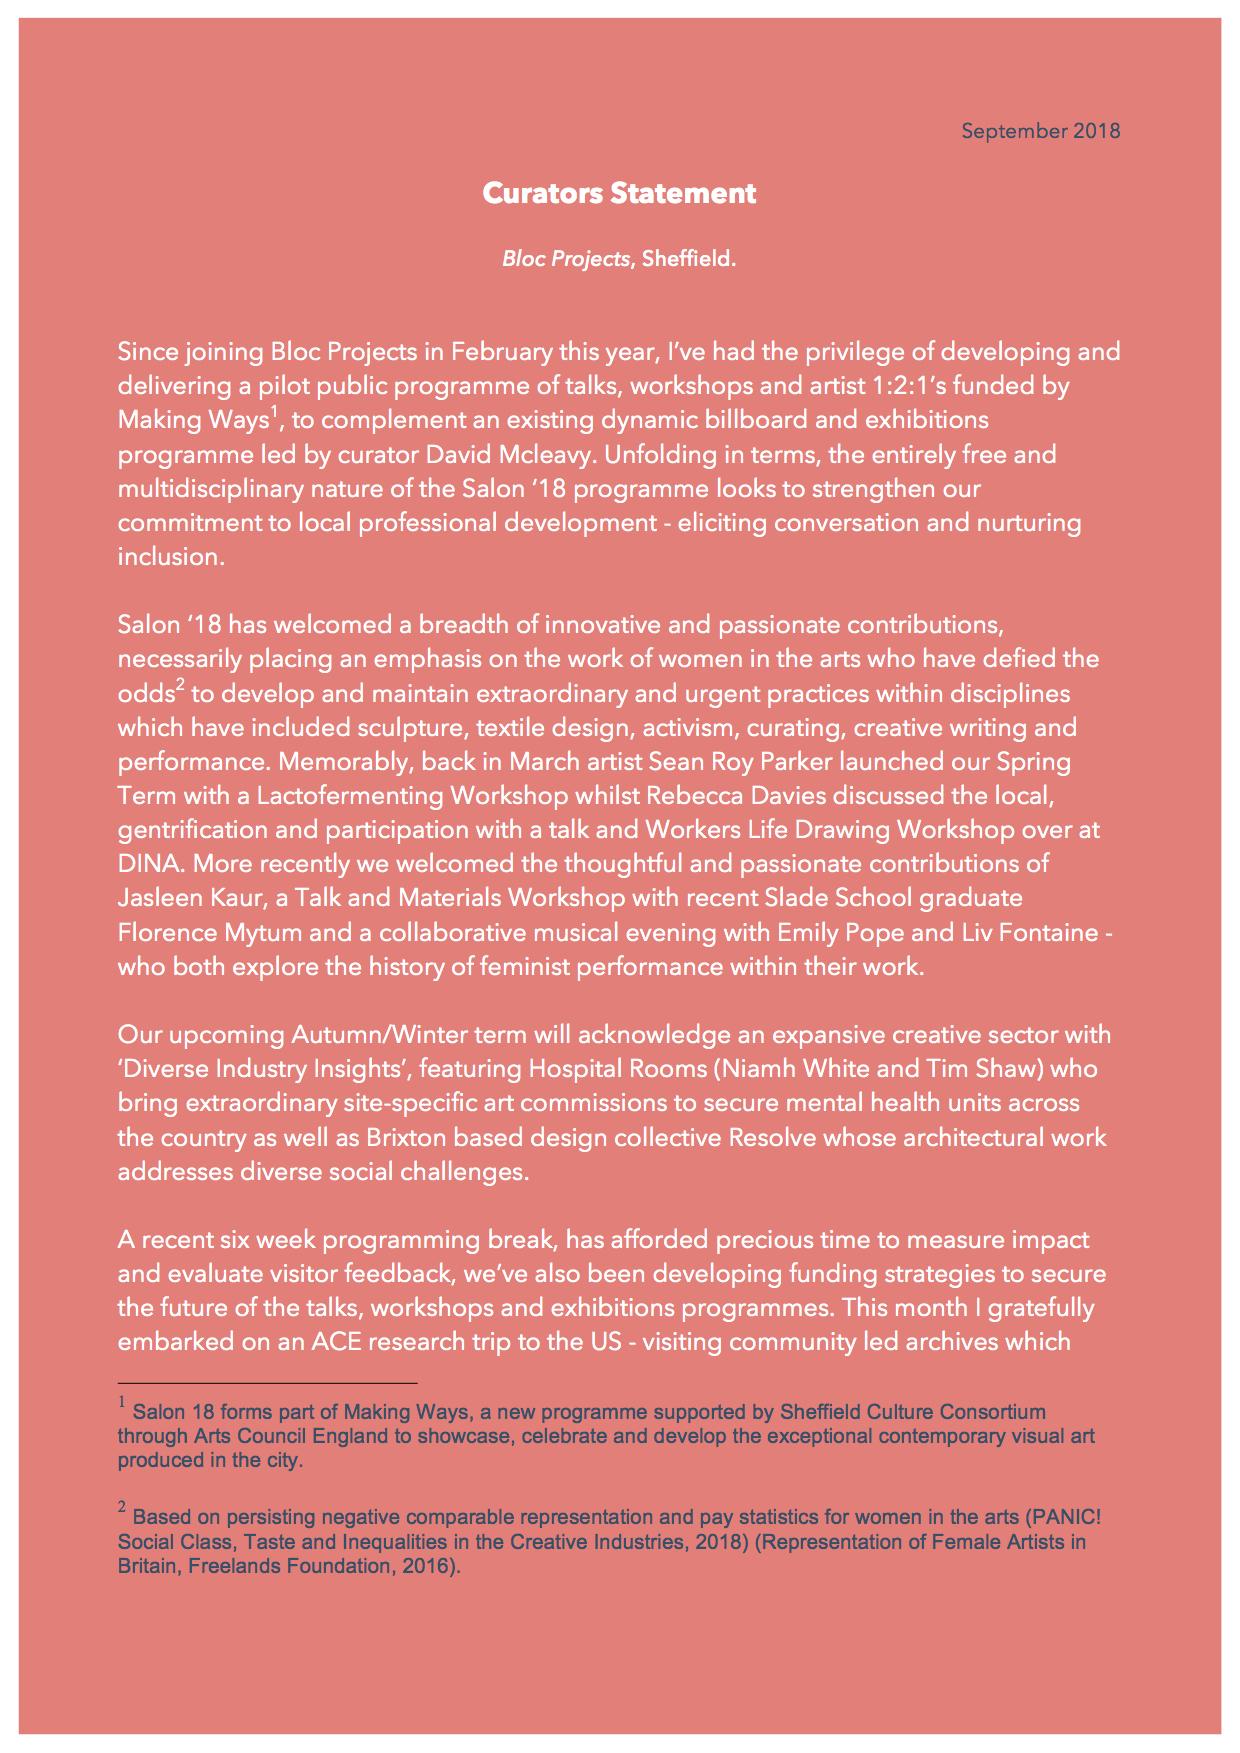 Curators Statement.jpg